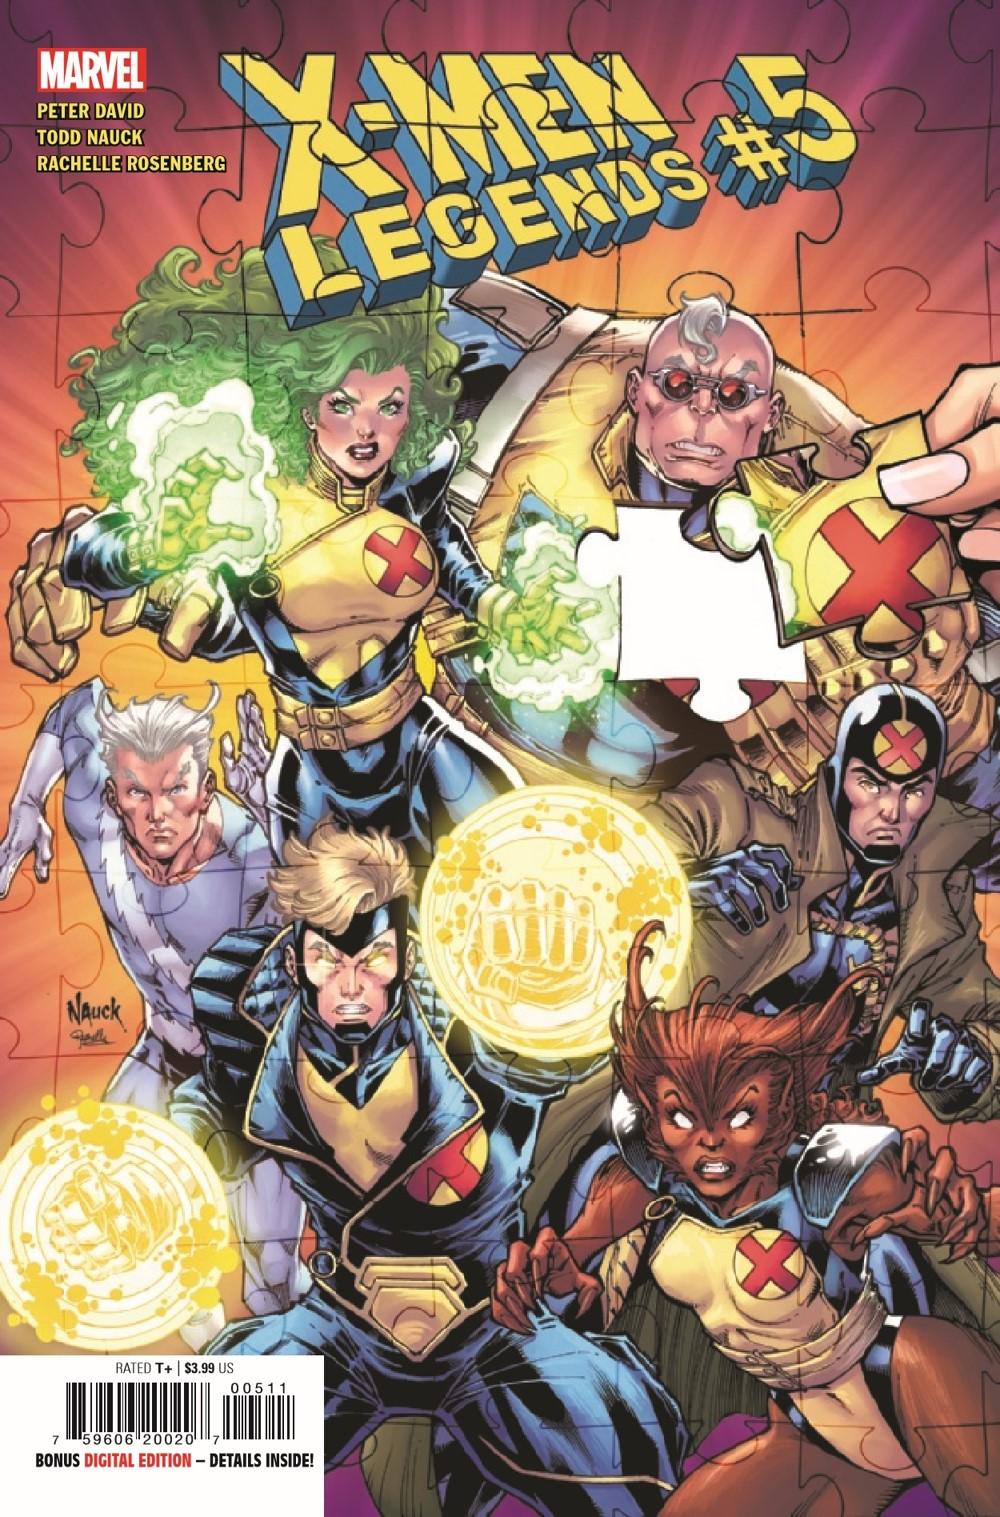 XMLEGENDS2021005_Preview-1 ComicList Previews: X-MEN LEGENDS #5